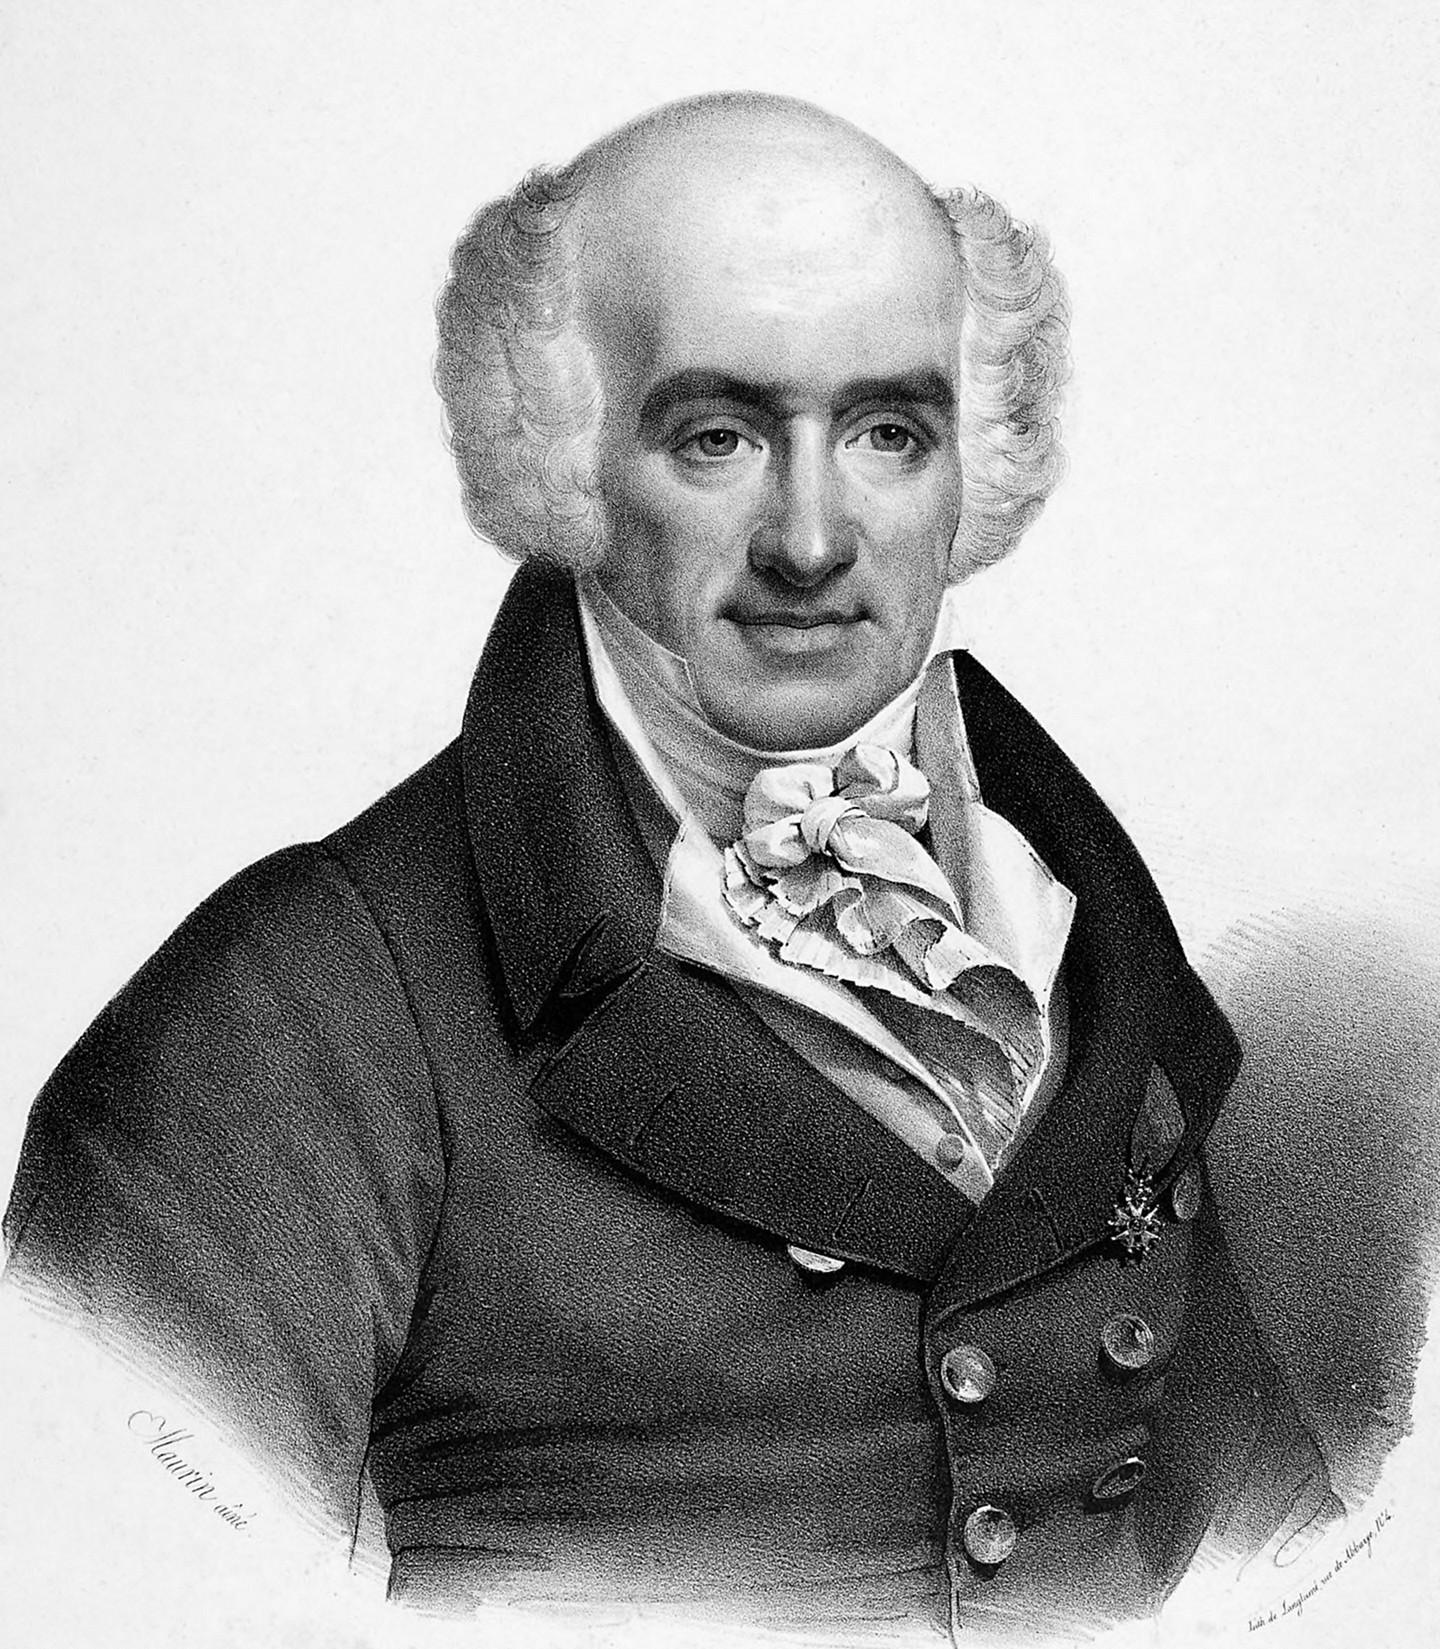 Giovanni_Battista_Viotti_by_Antoine_Maurin